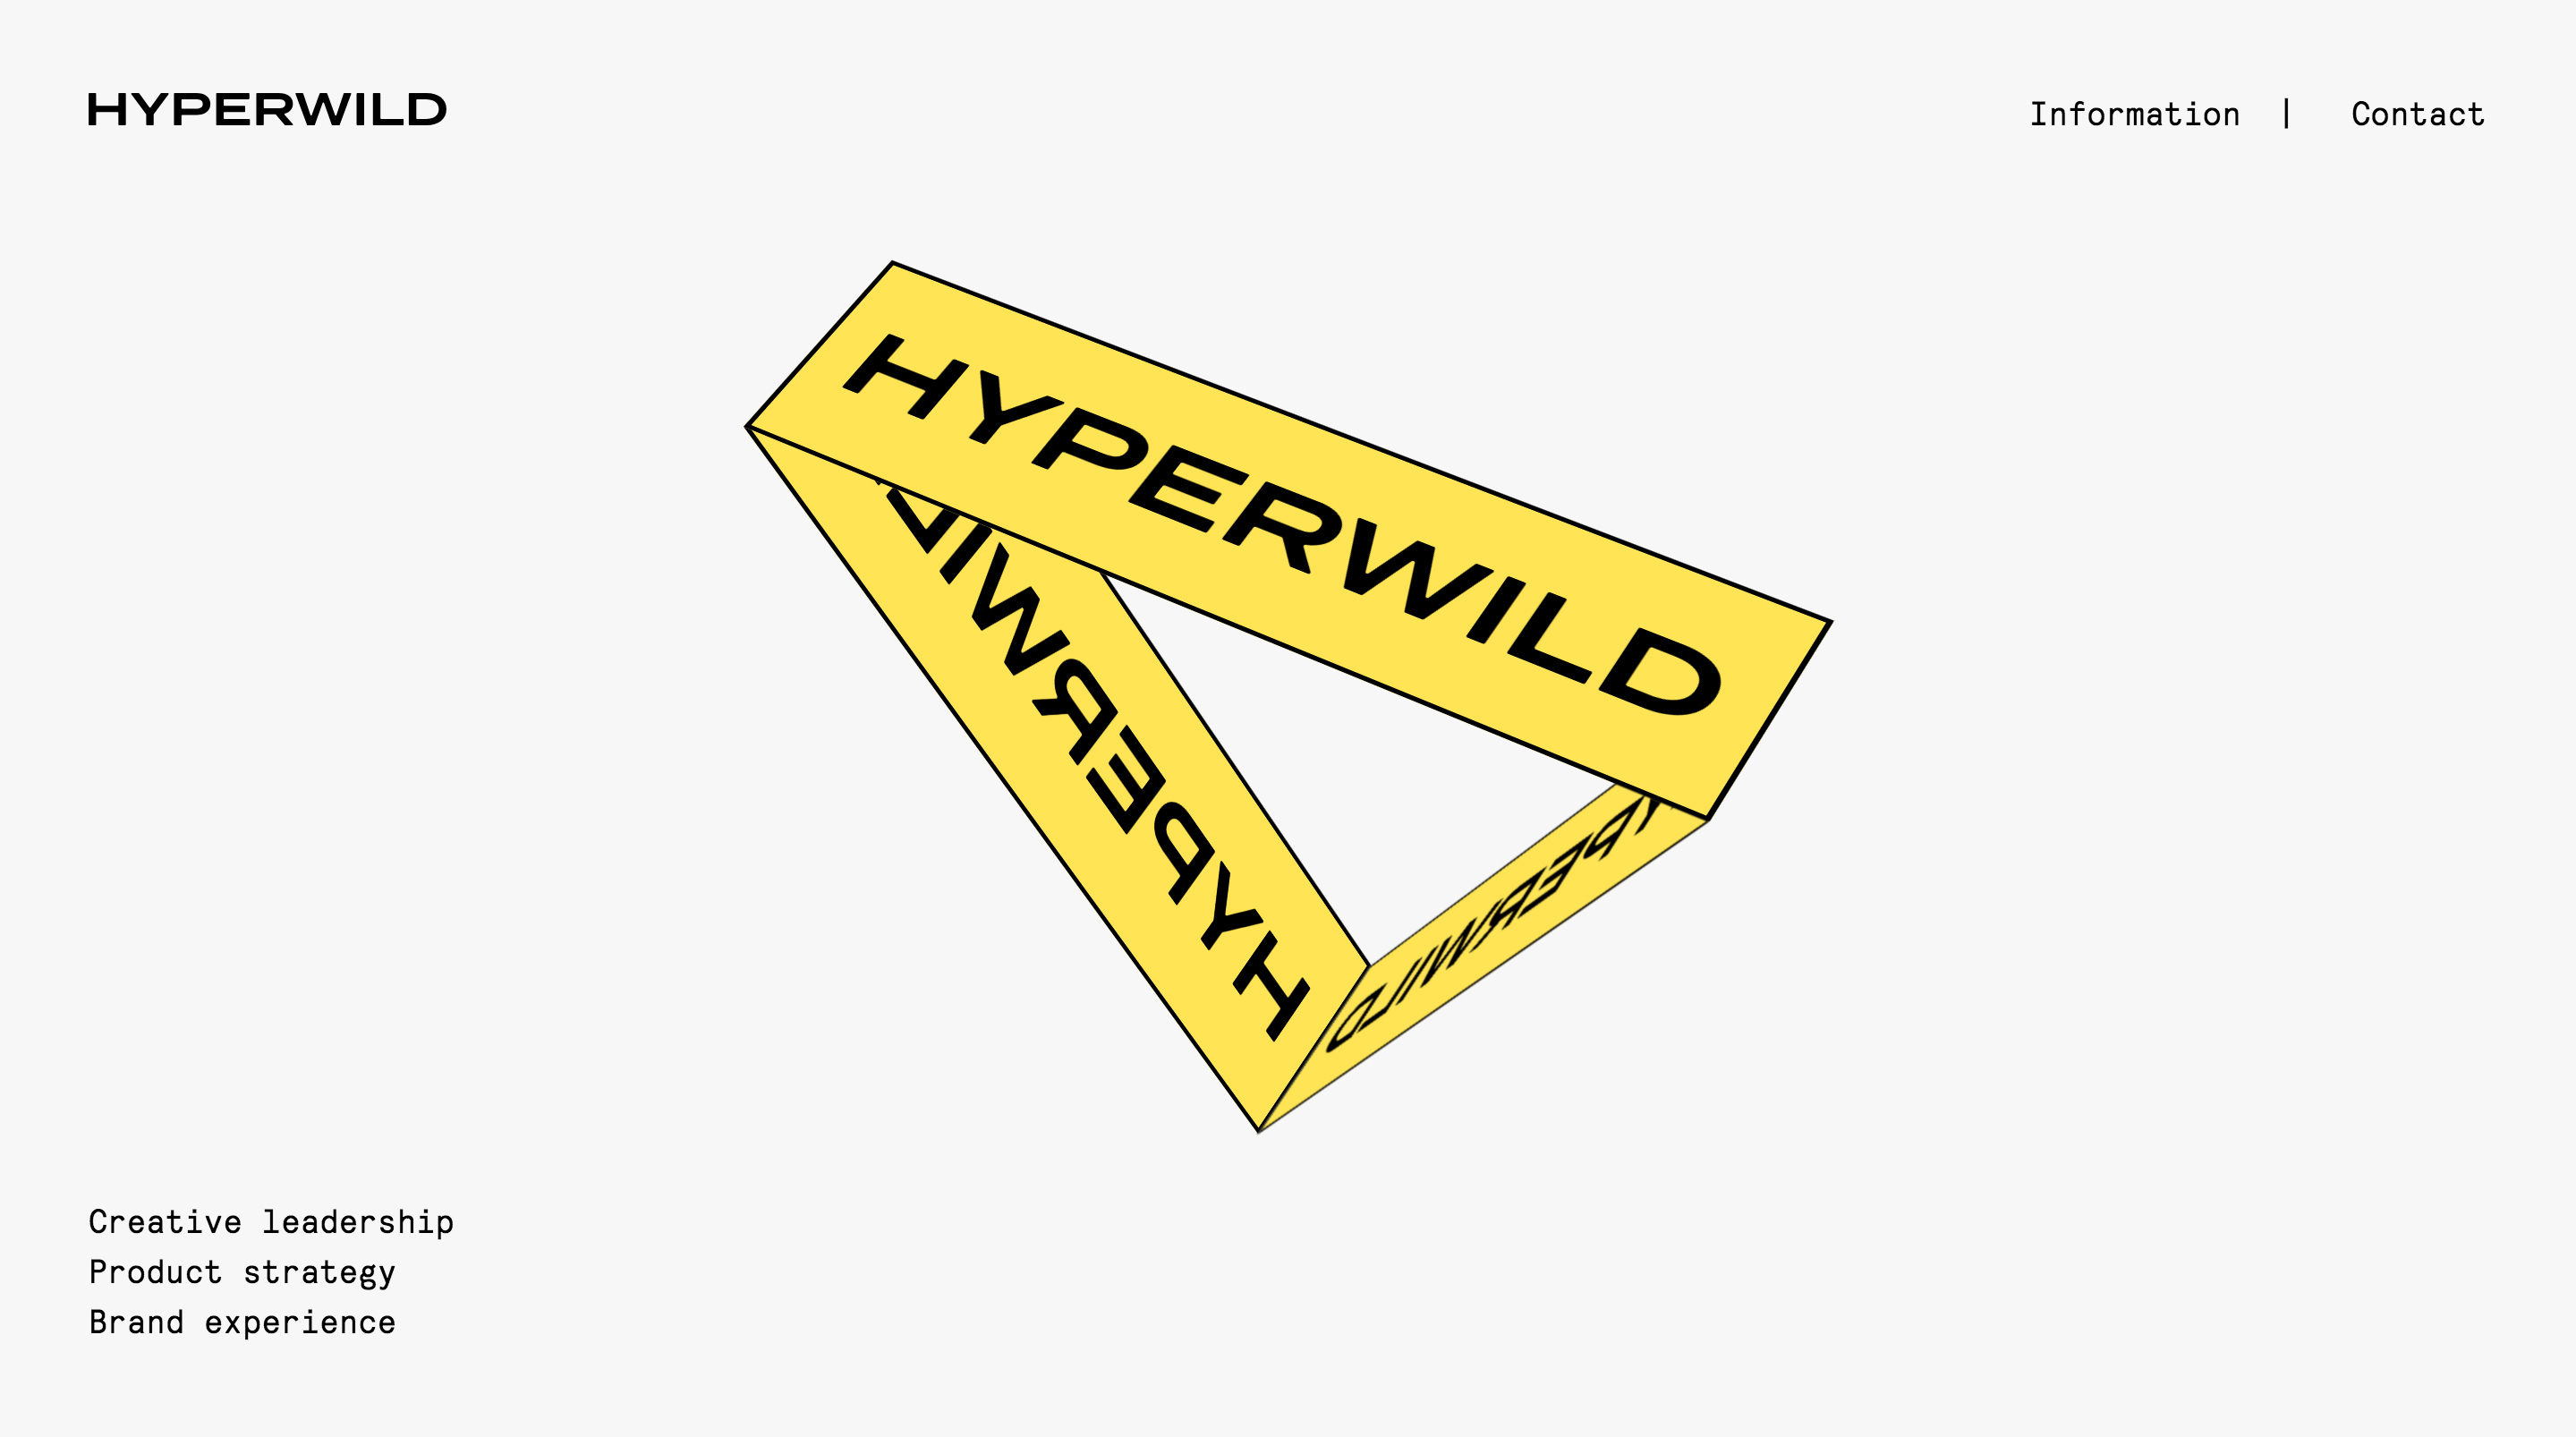 Hyperwild